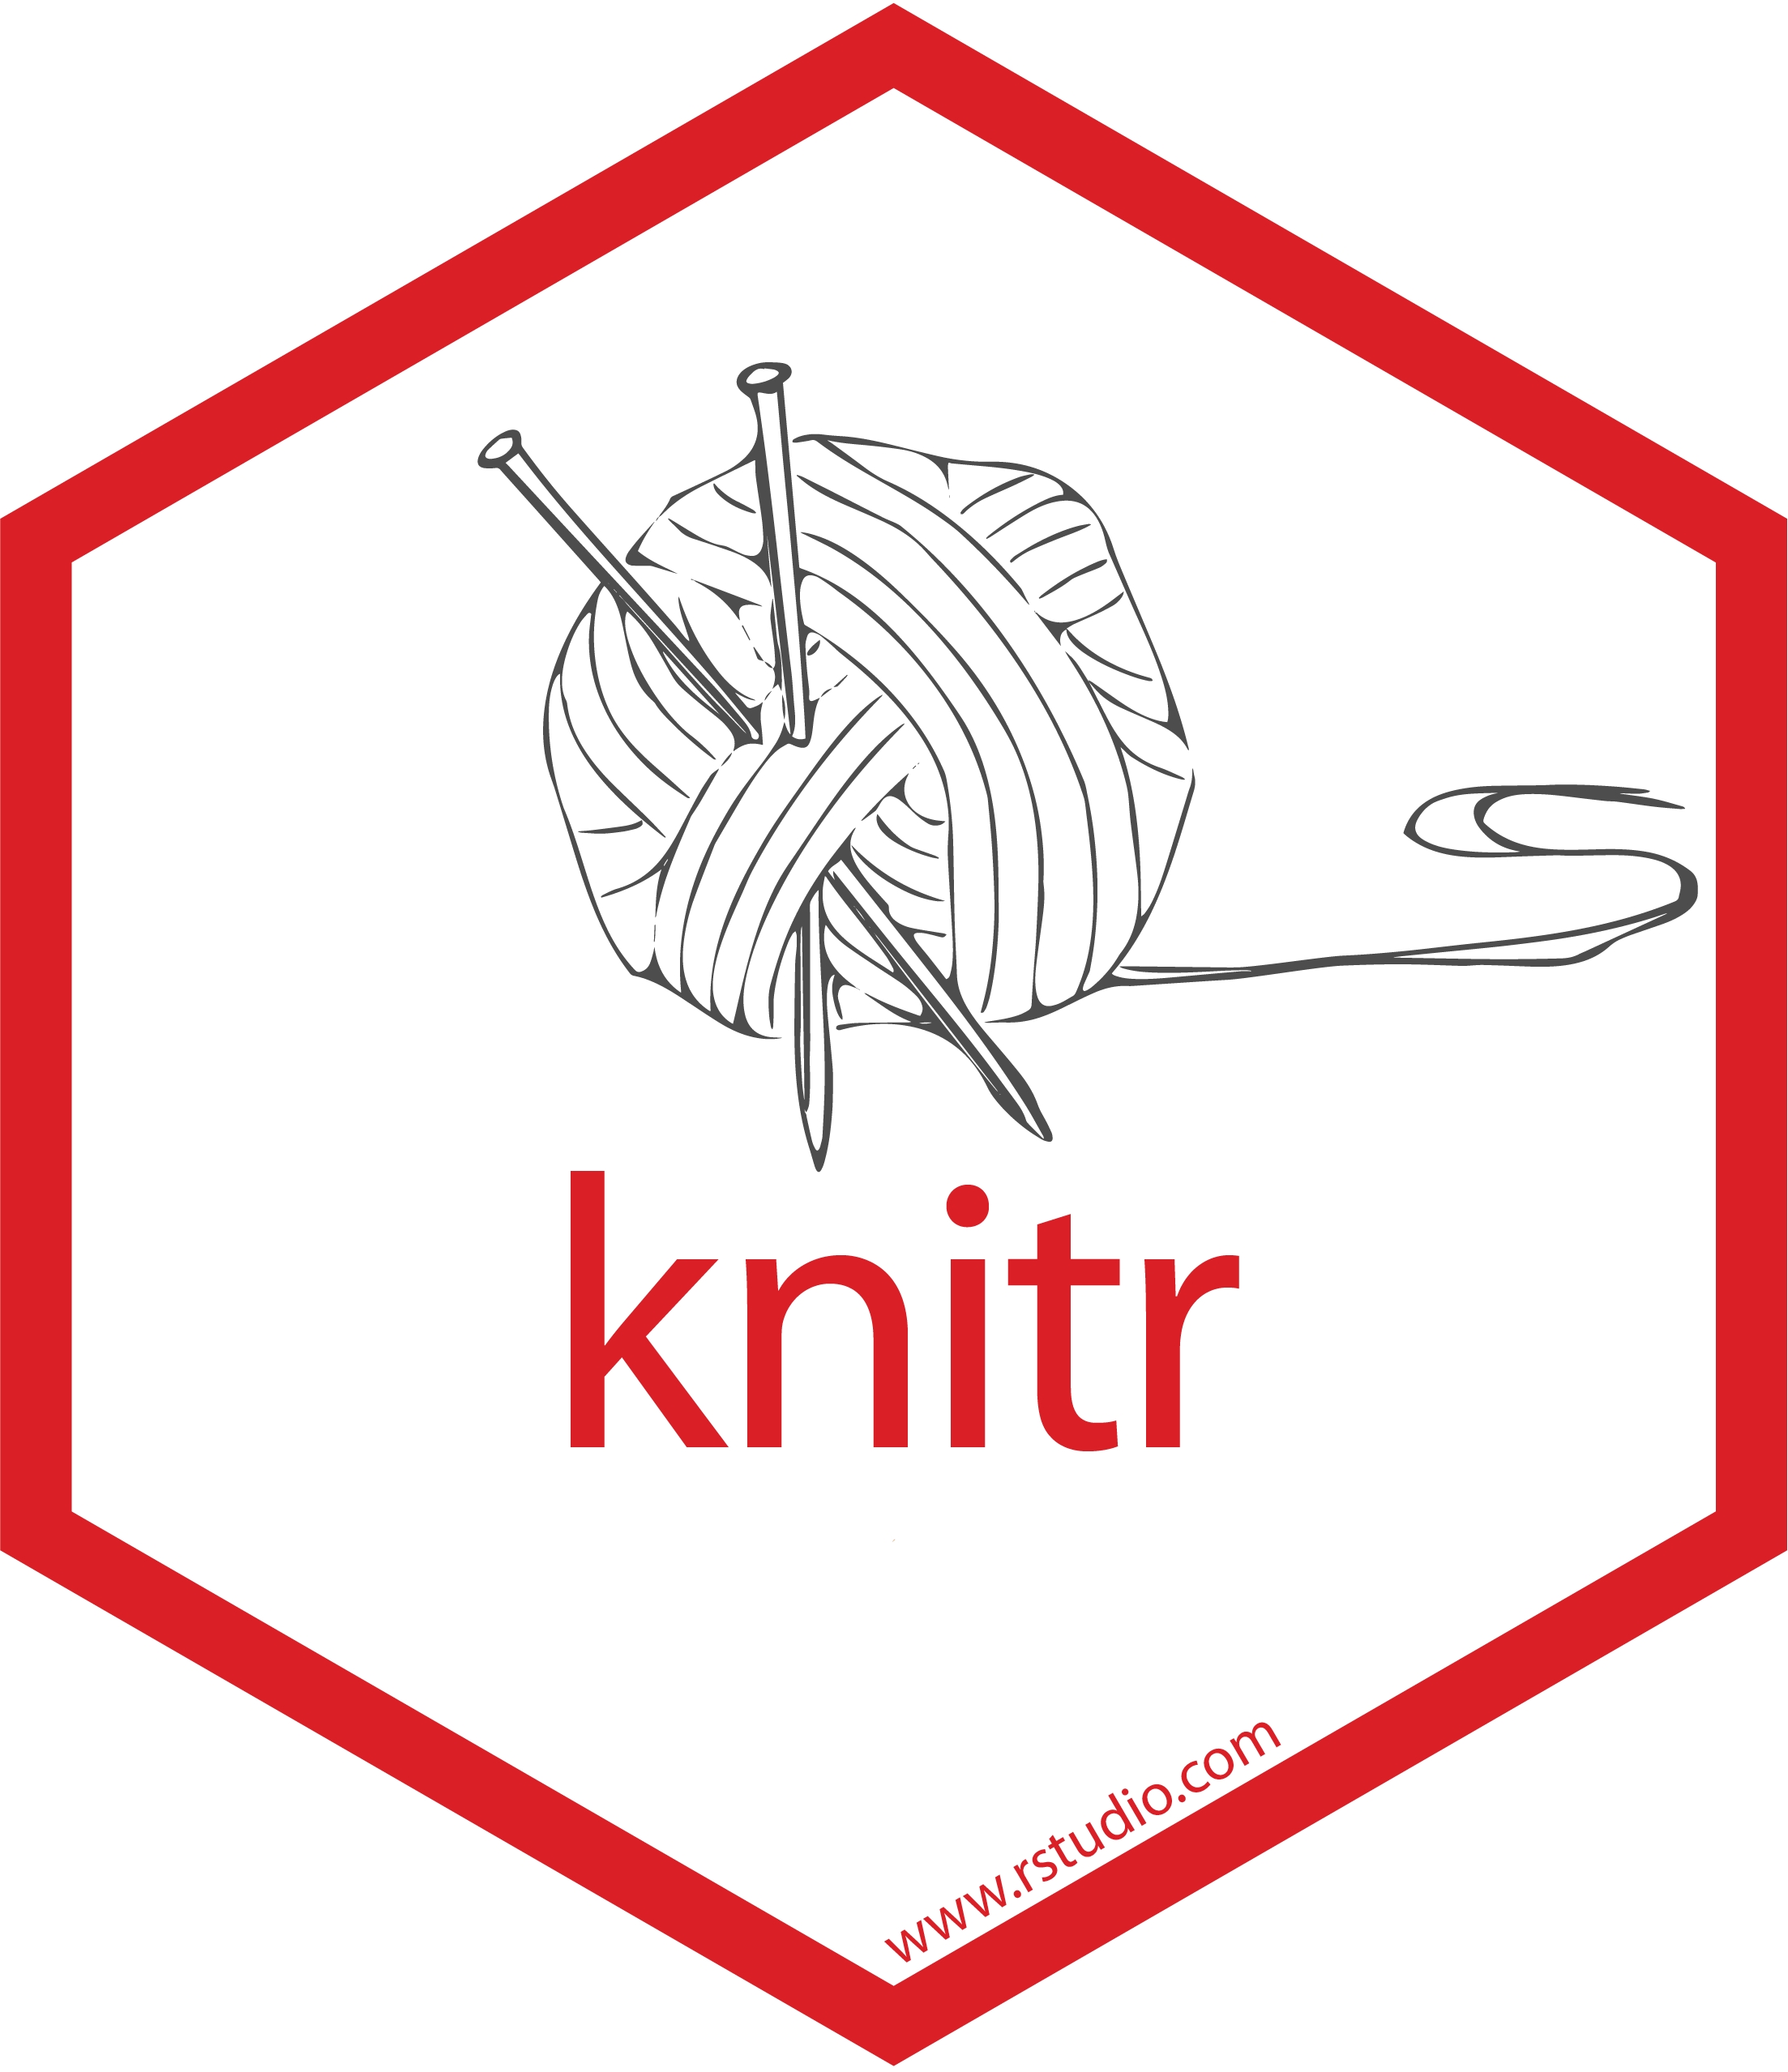 r-cran-knitr avatar